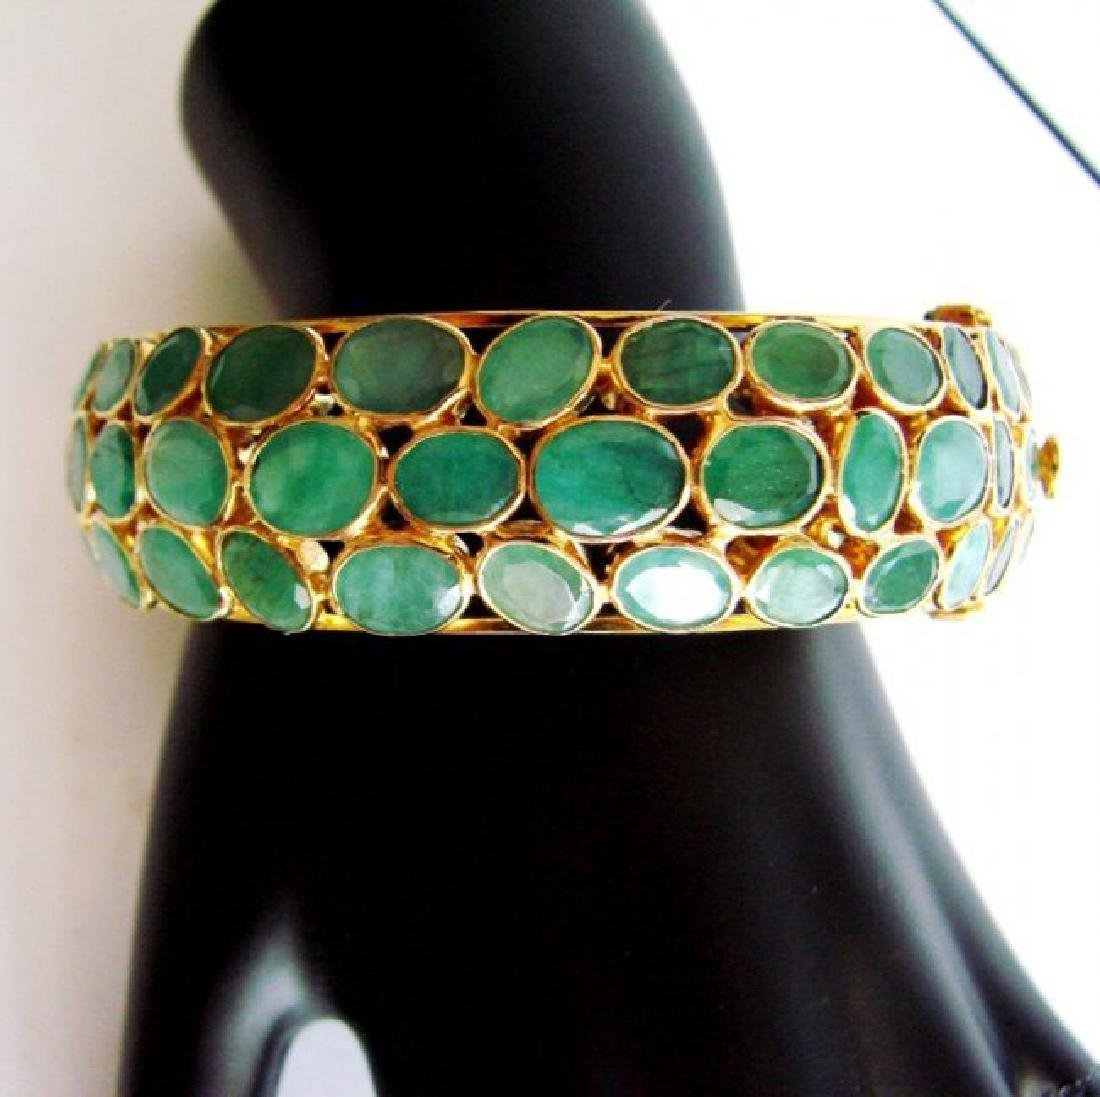 Natural Emerald Bangle 113.71Ct 18k Y/g Overlay - 3